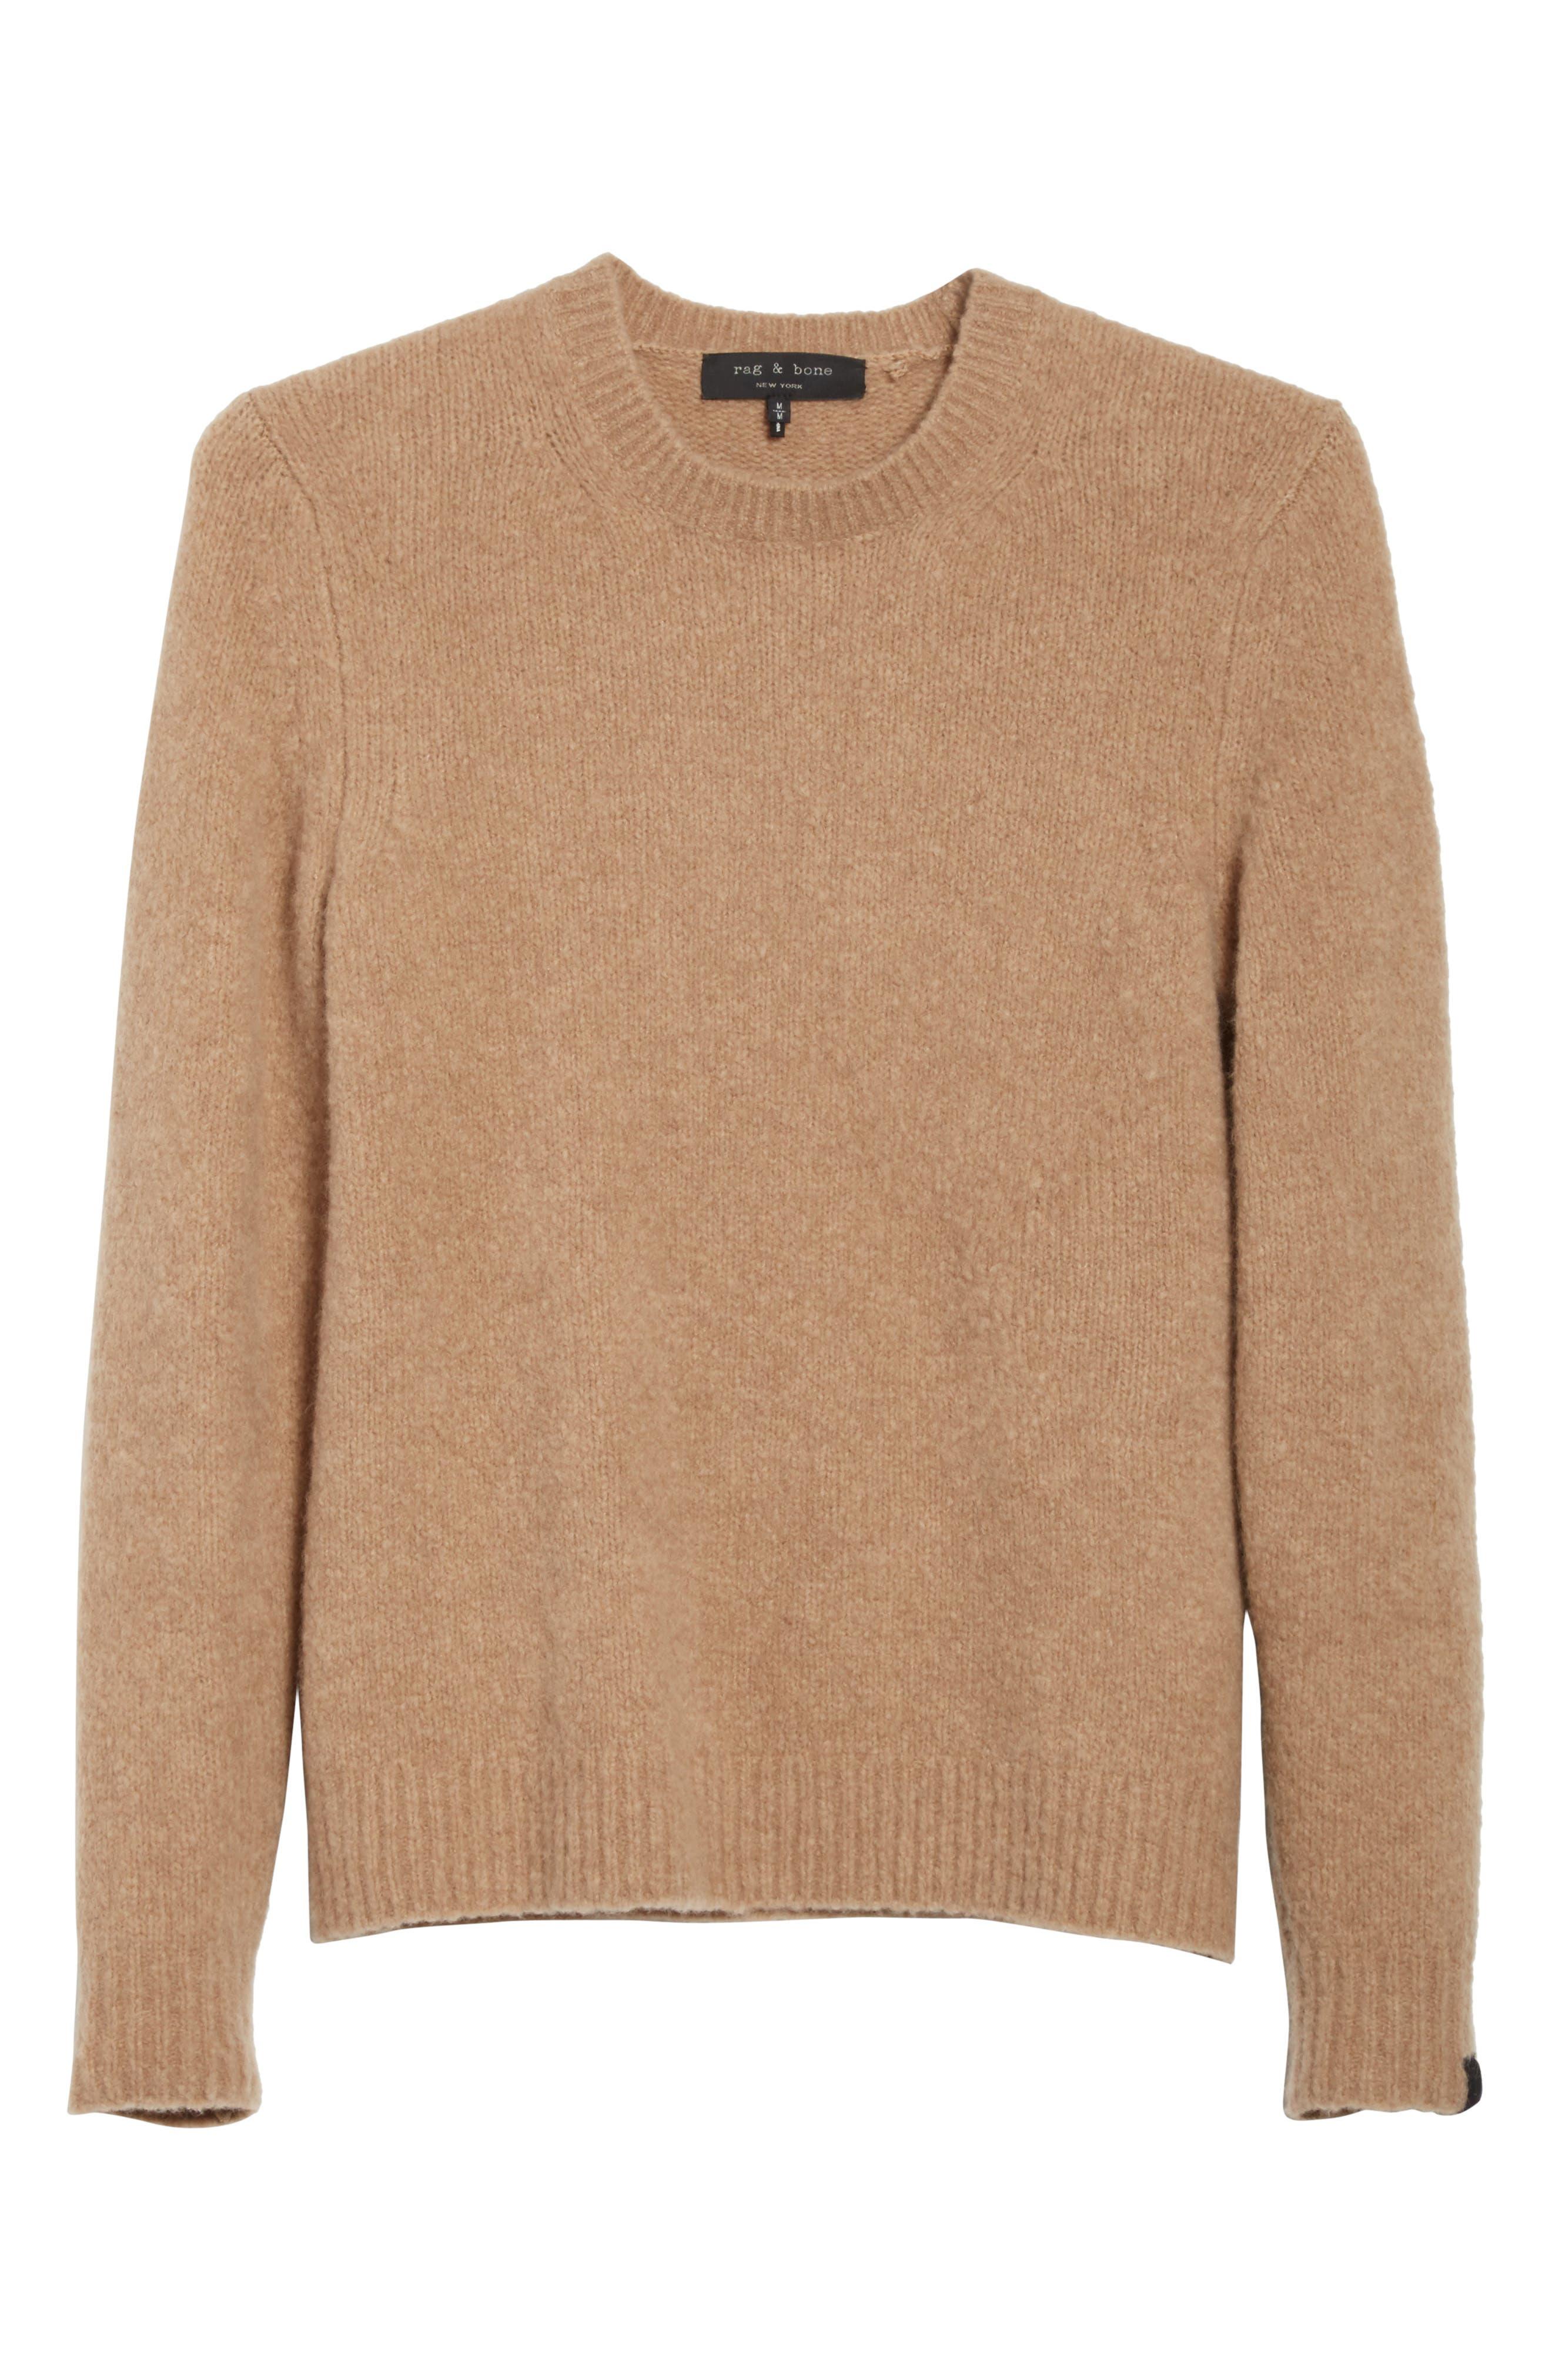 Charles Merino Wool Blend Sweater,                             Alternate thumbnail 6, color,                             230